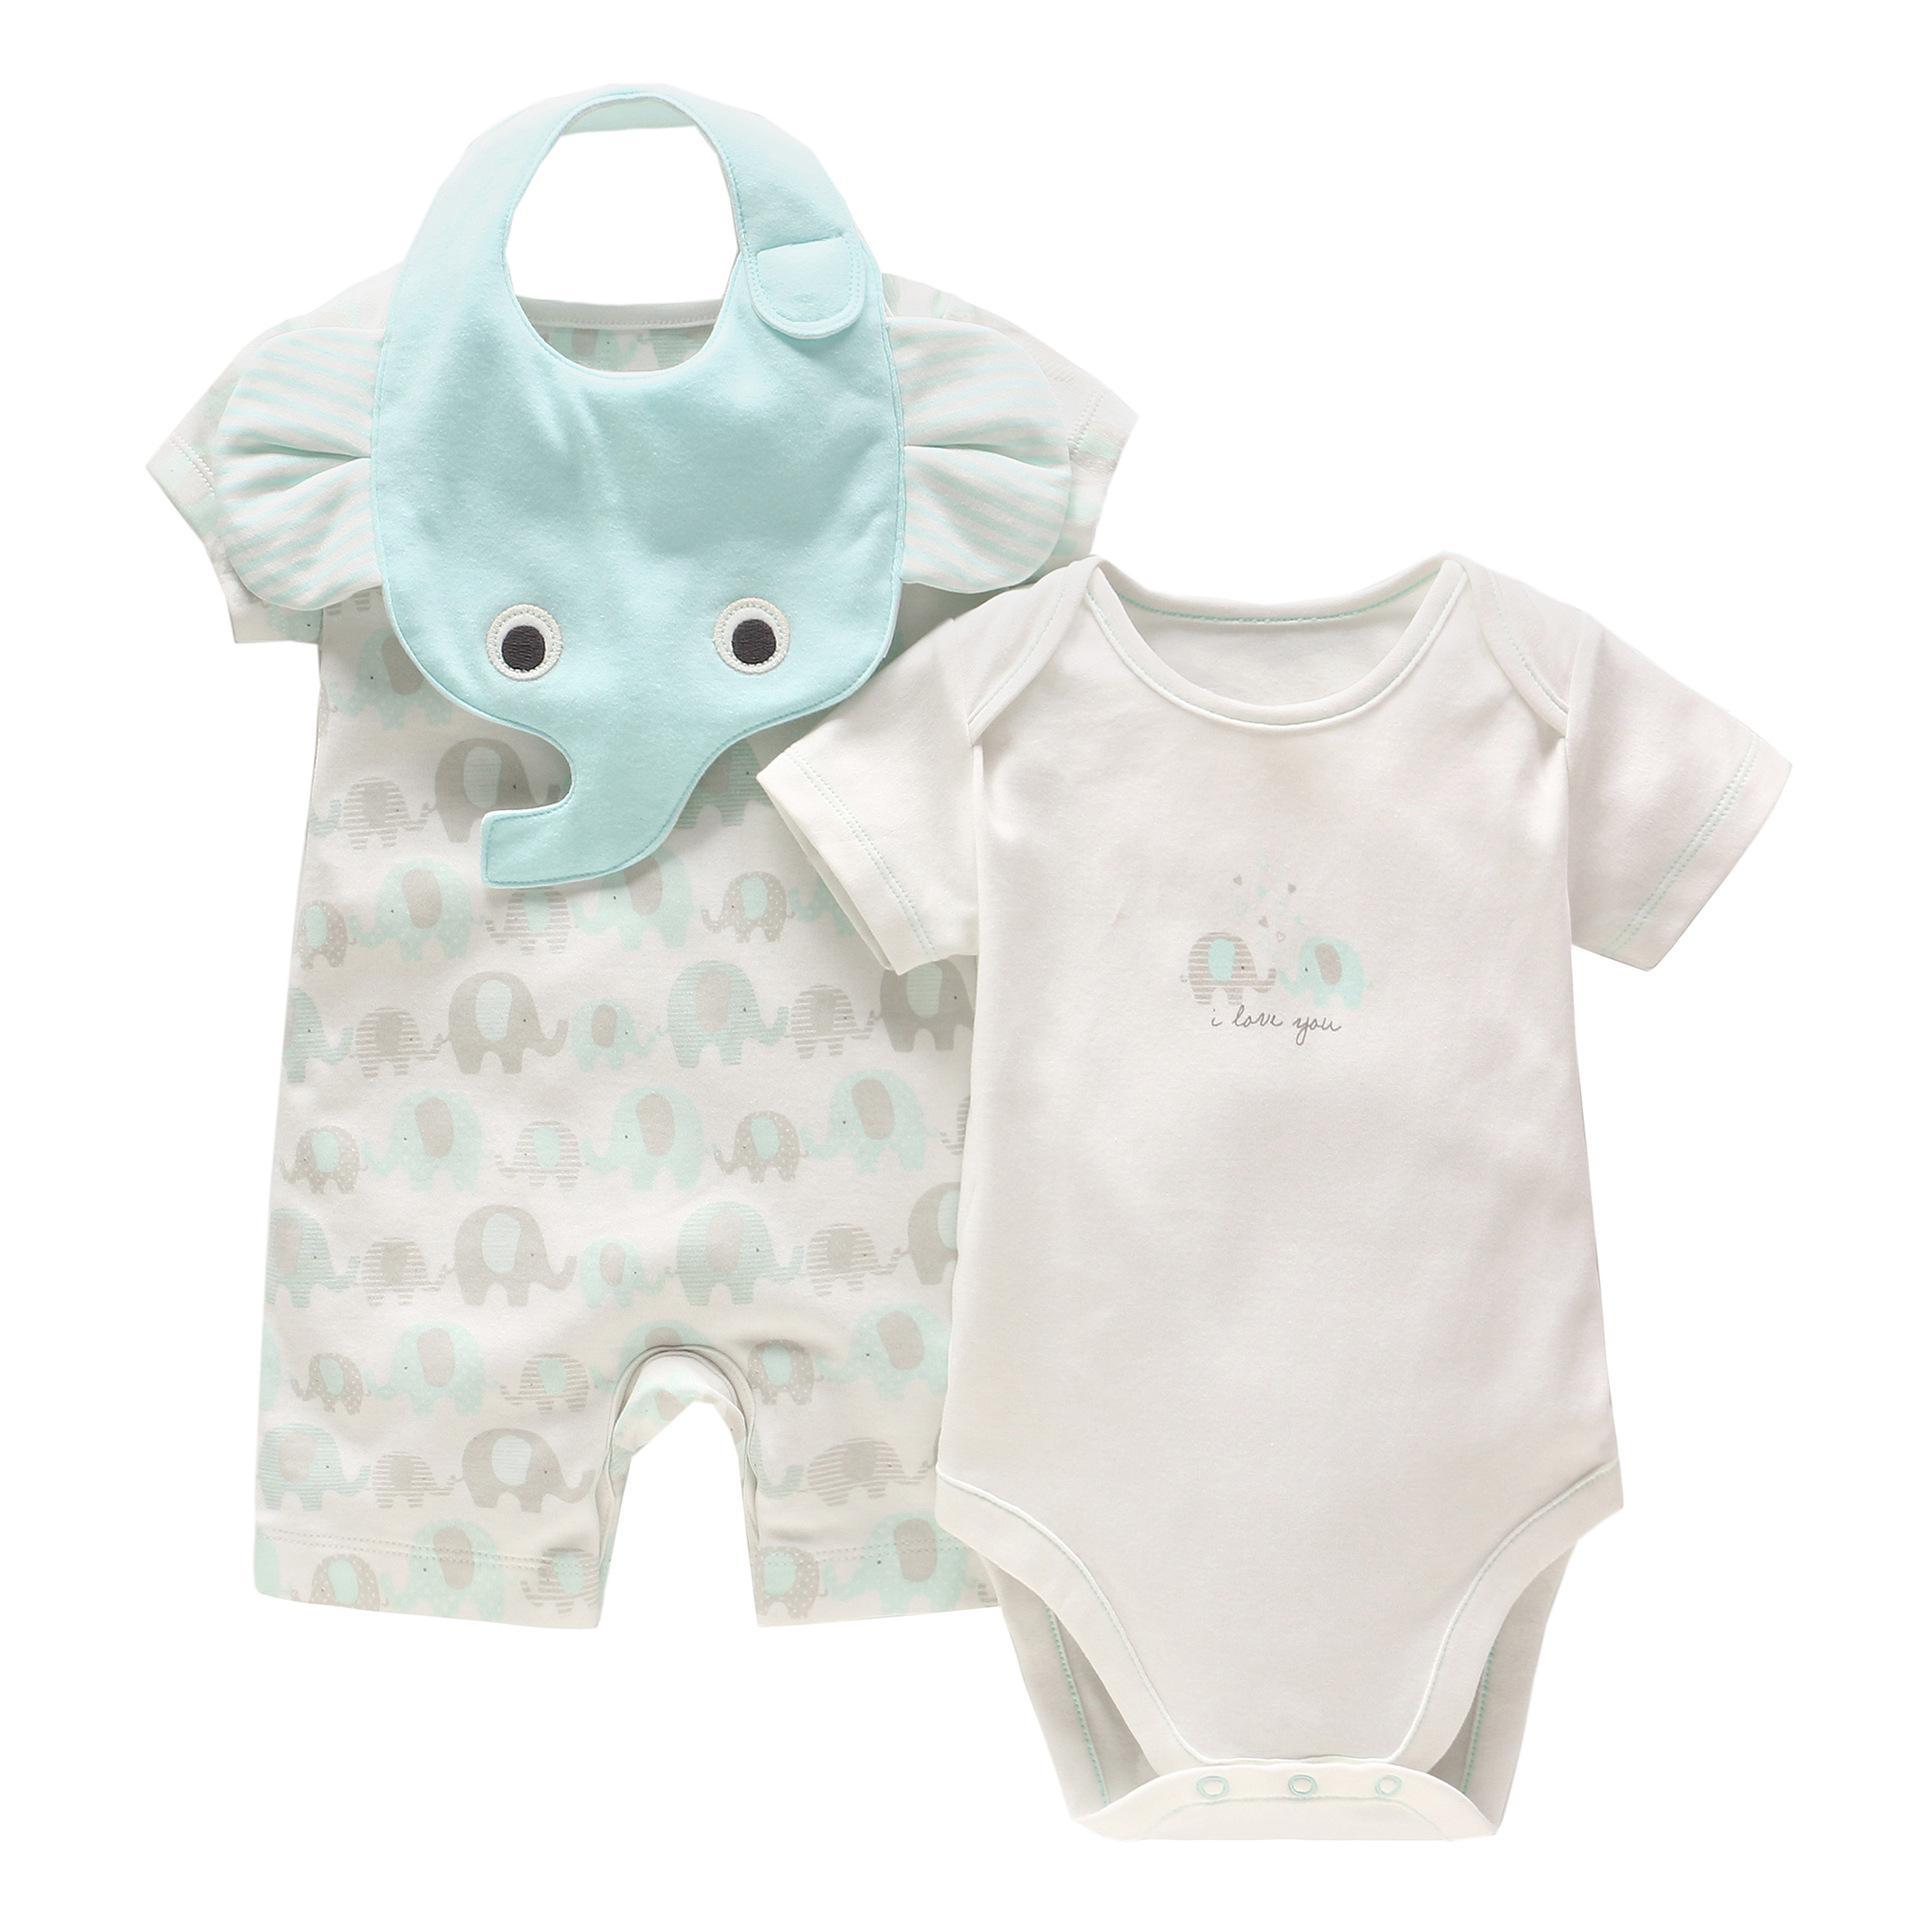 9d7f5d78a854 2019 New Baby Boy Clothing Set Summer Baby Cotton Bodysuit +Elephant ...